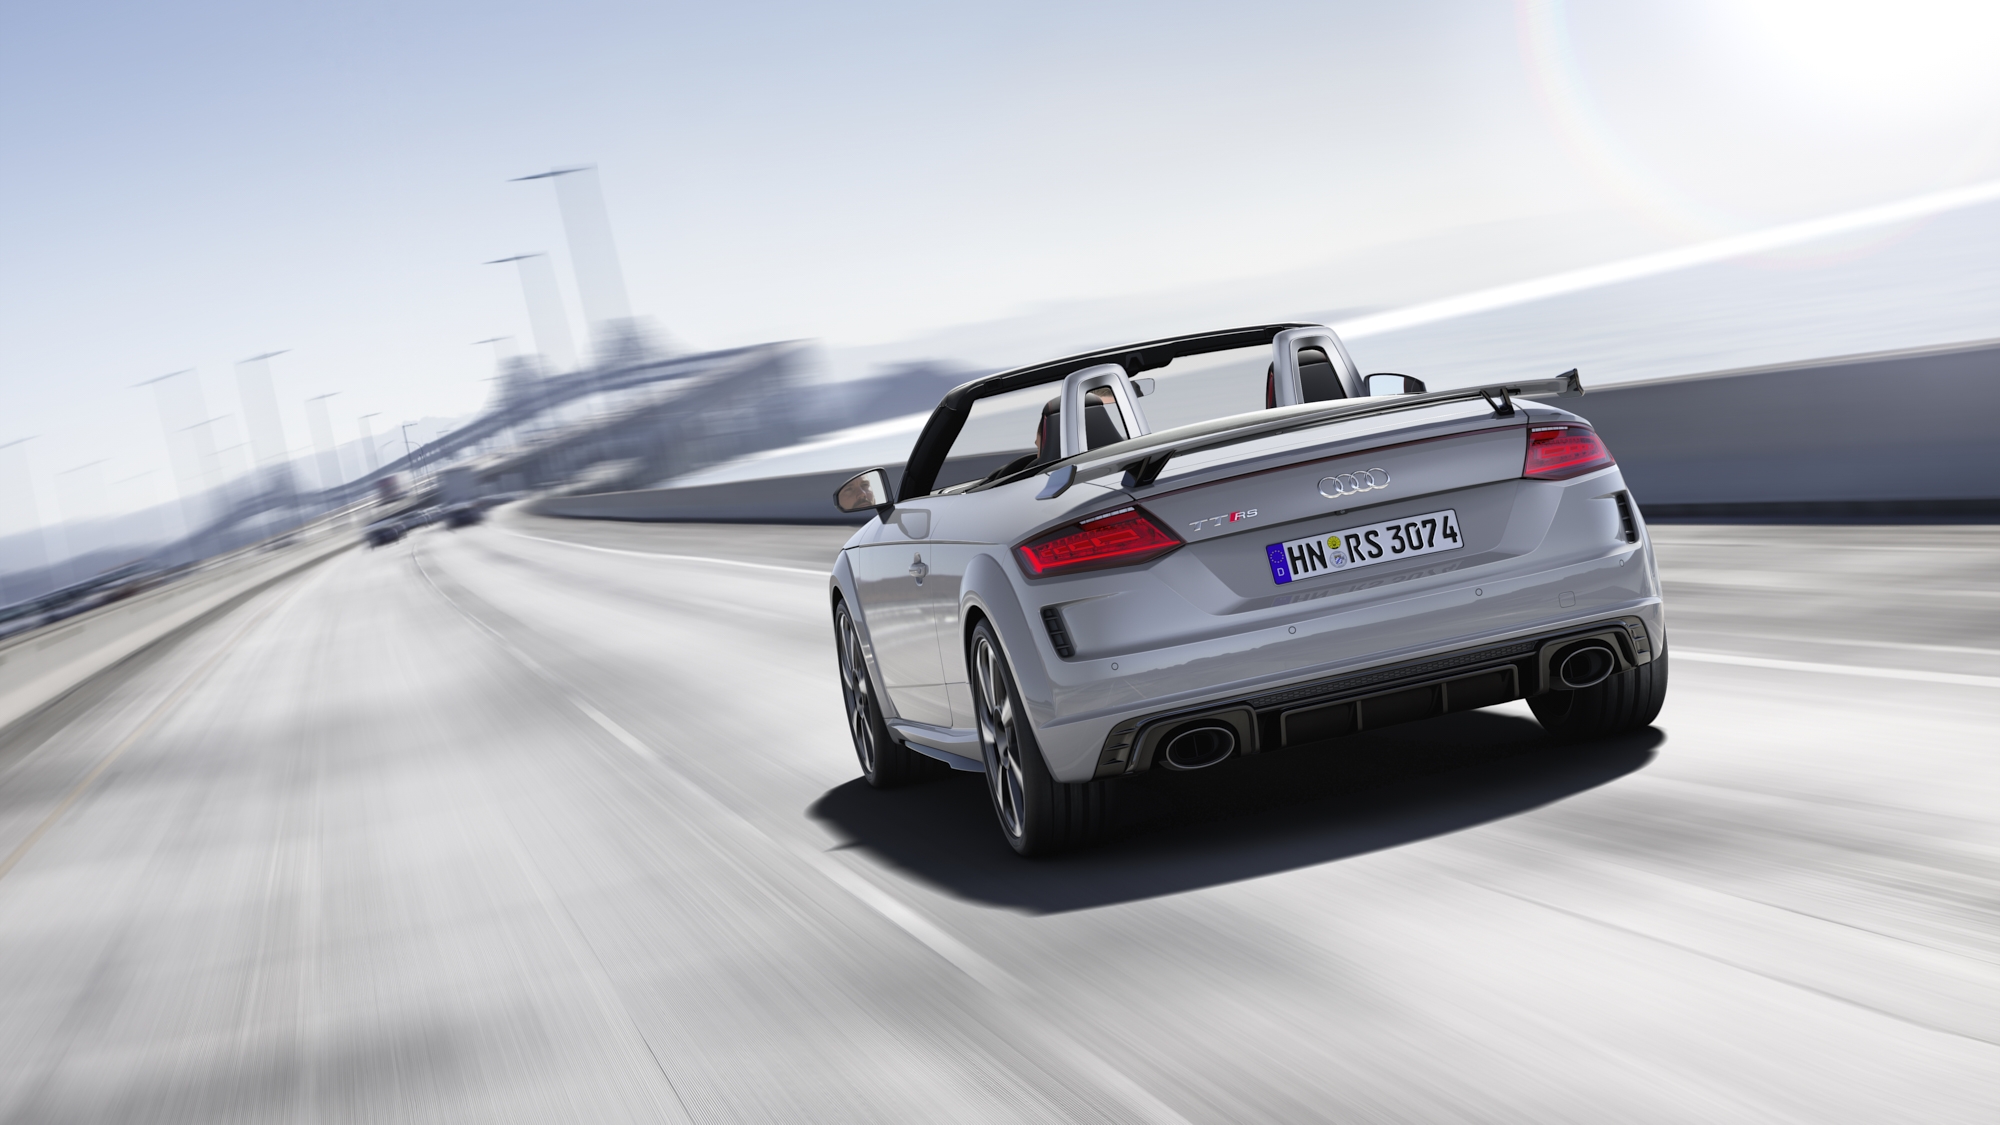 RWink_Audi_TT_RS_Roadster_Speed_001_B2200